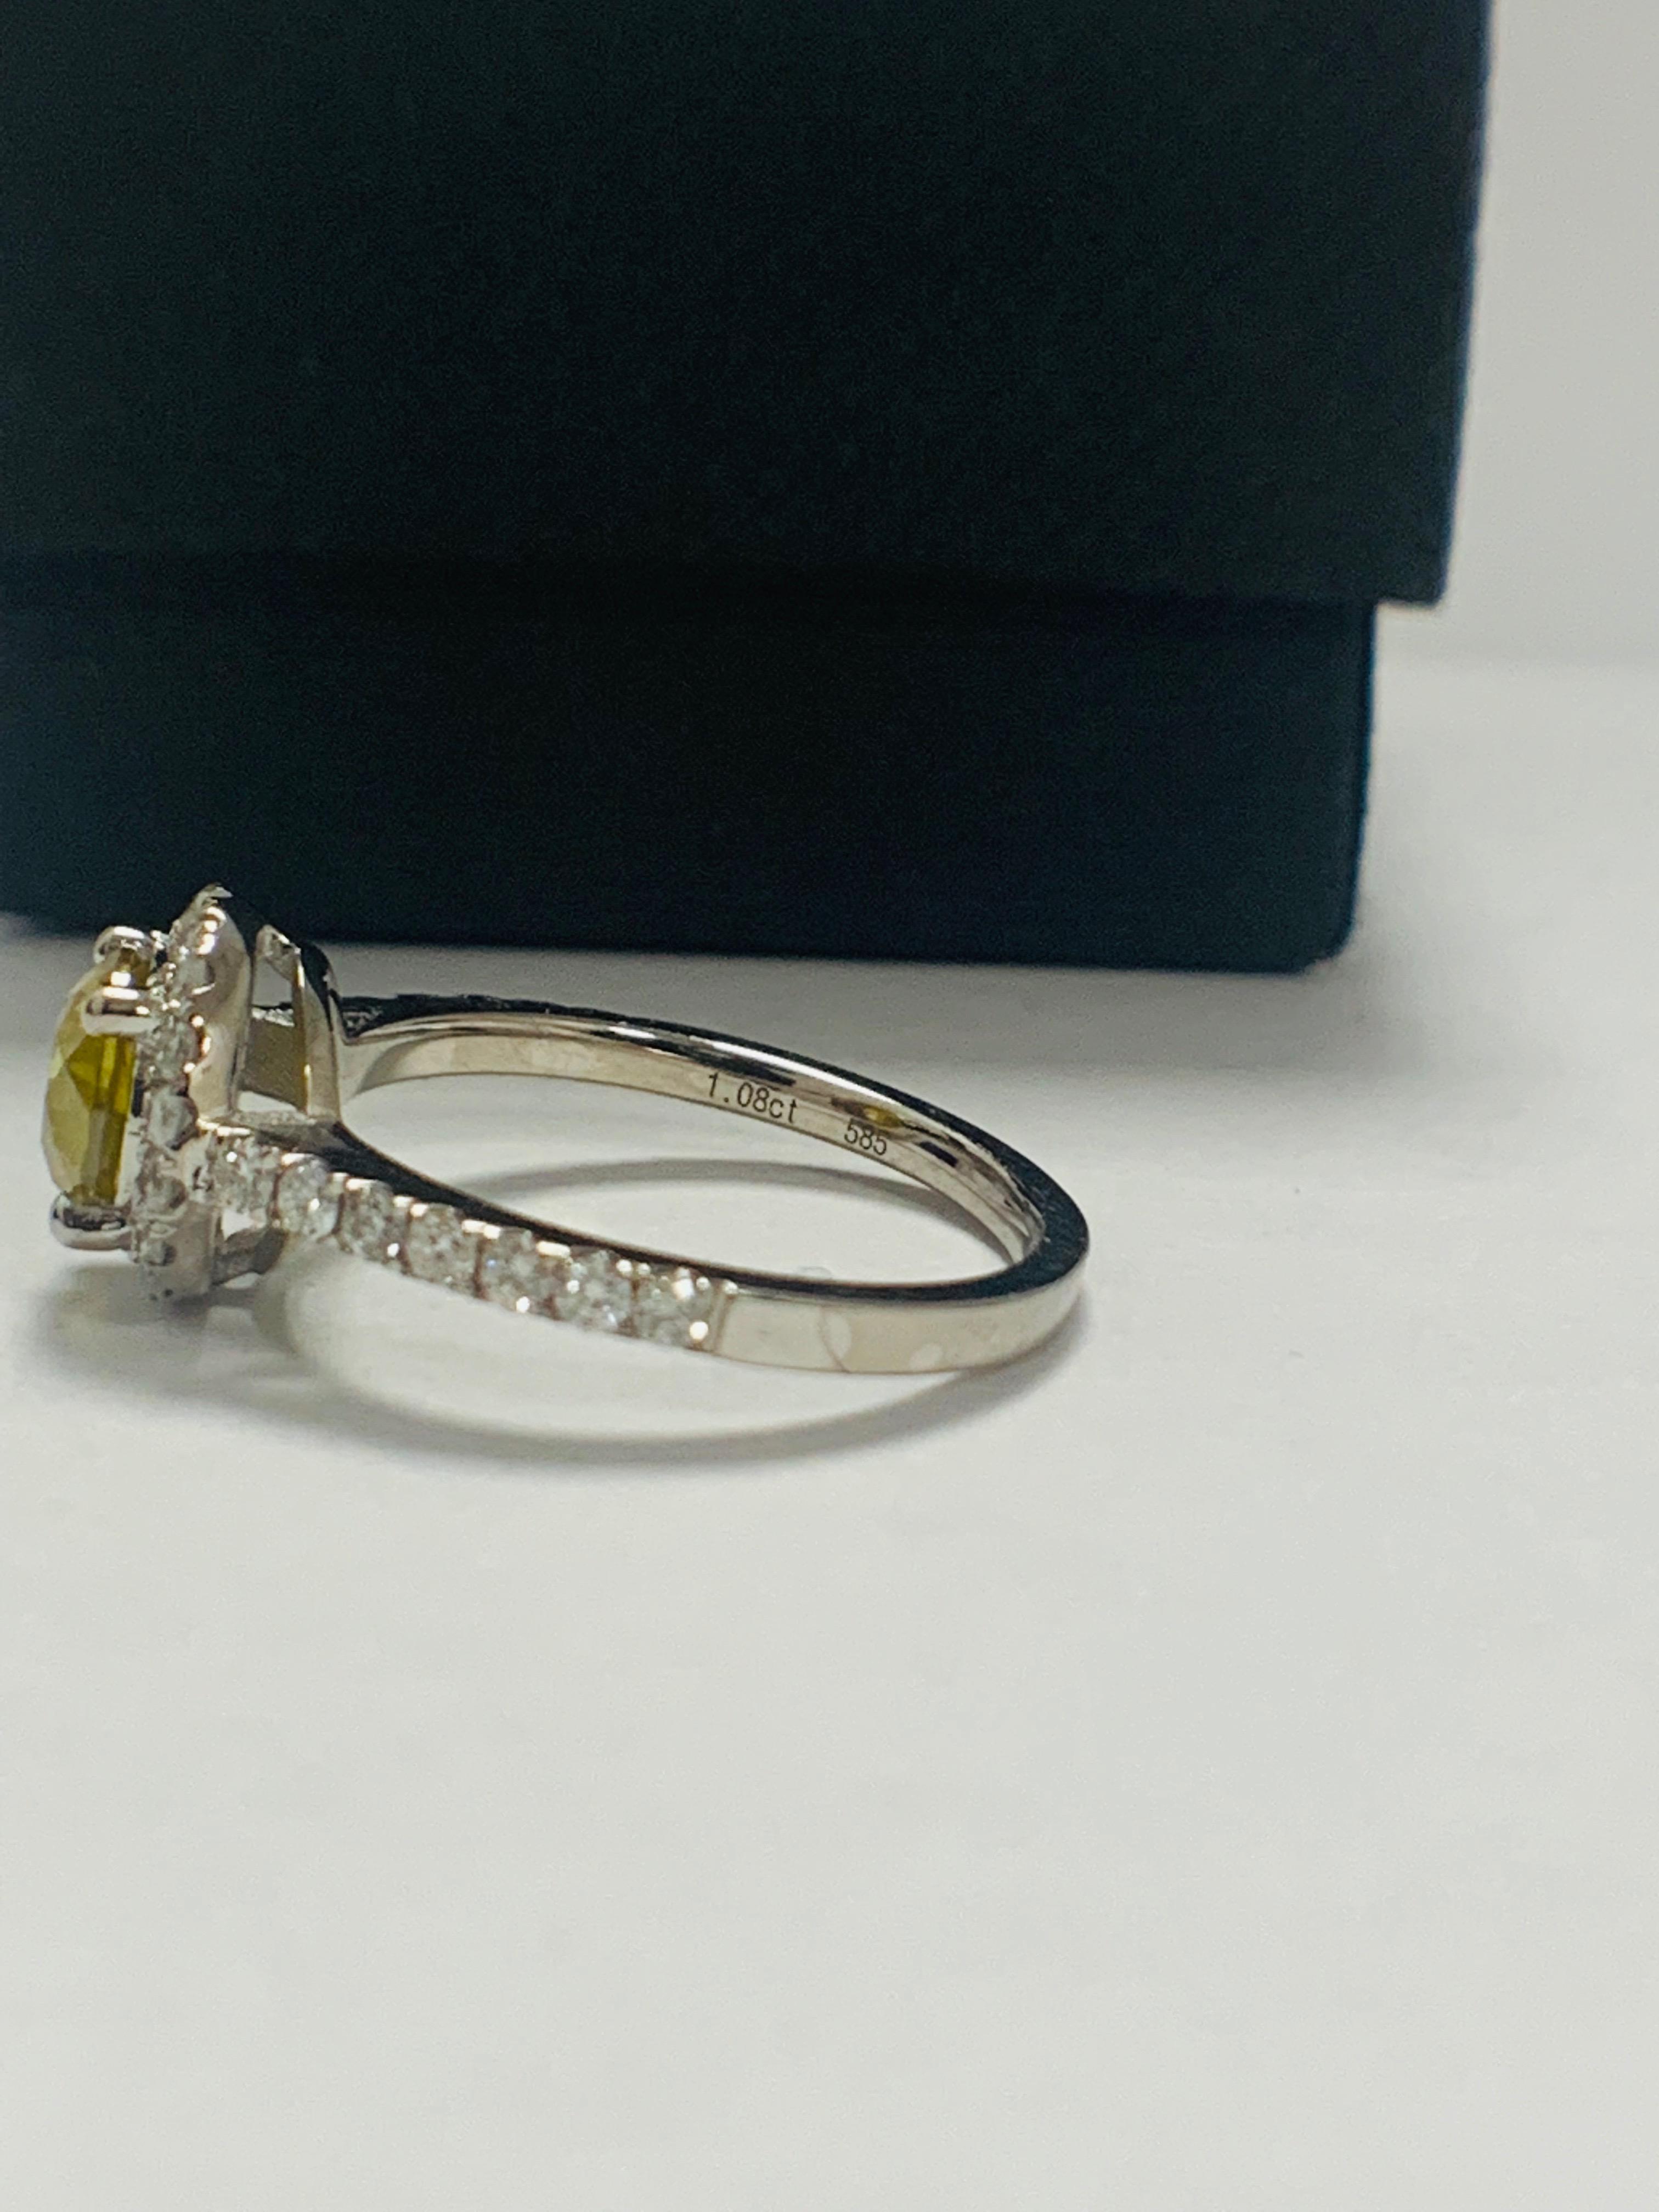 14ct White Gold Diamond ring featuring centre, round brilliant cut, yellow Diamond (1.08ct) - Image 4 of 12